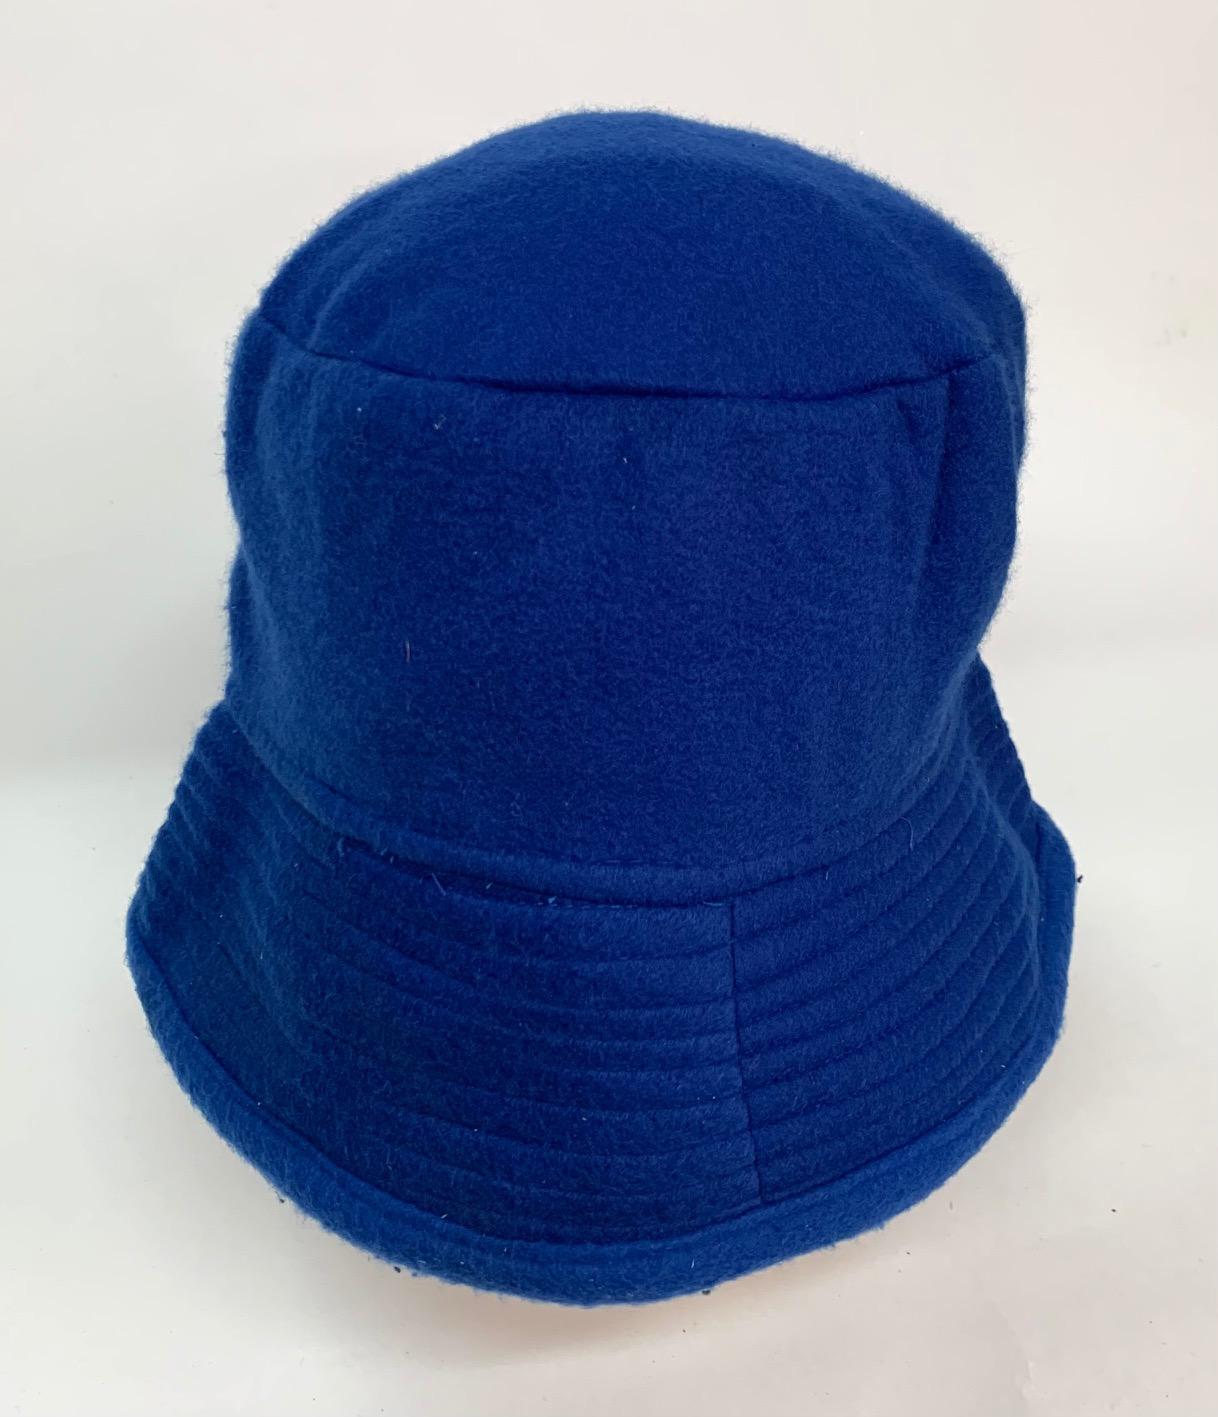 Практичная синяя панама из флиса